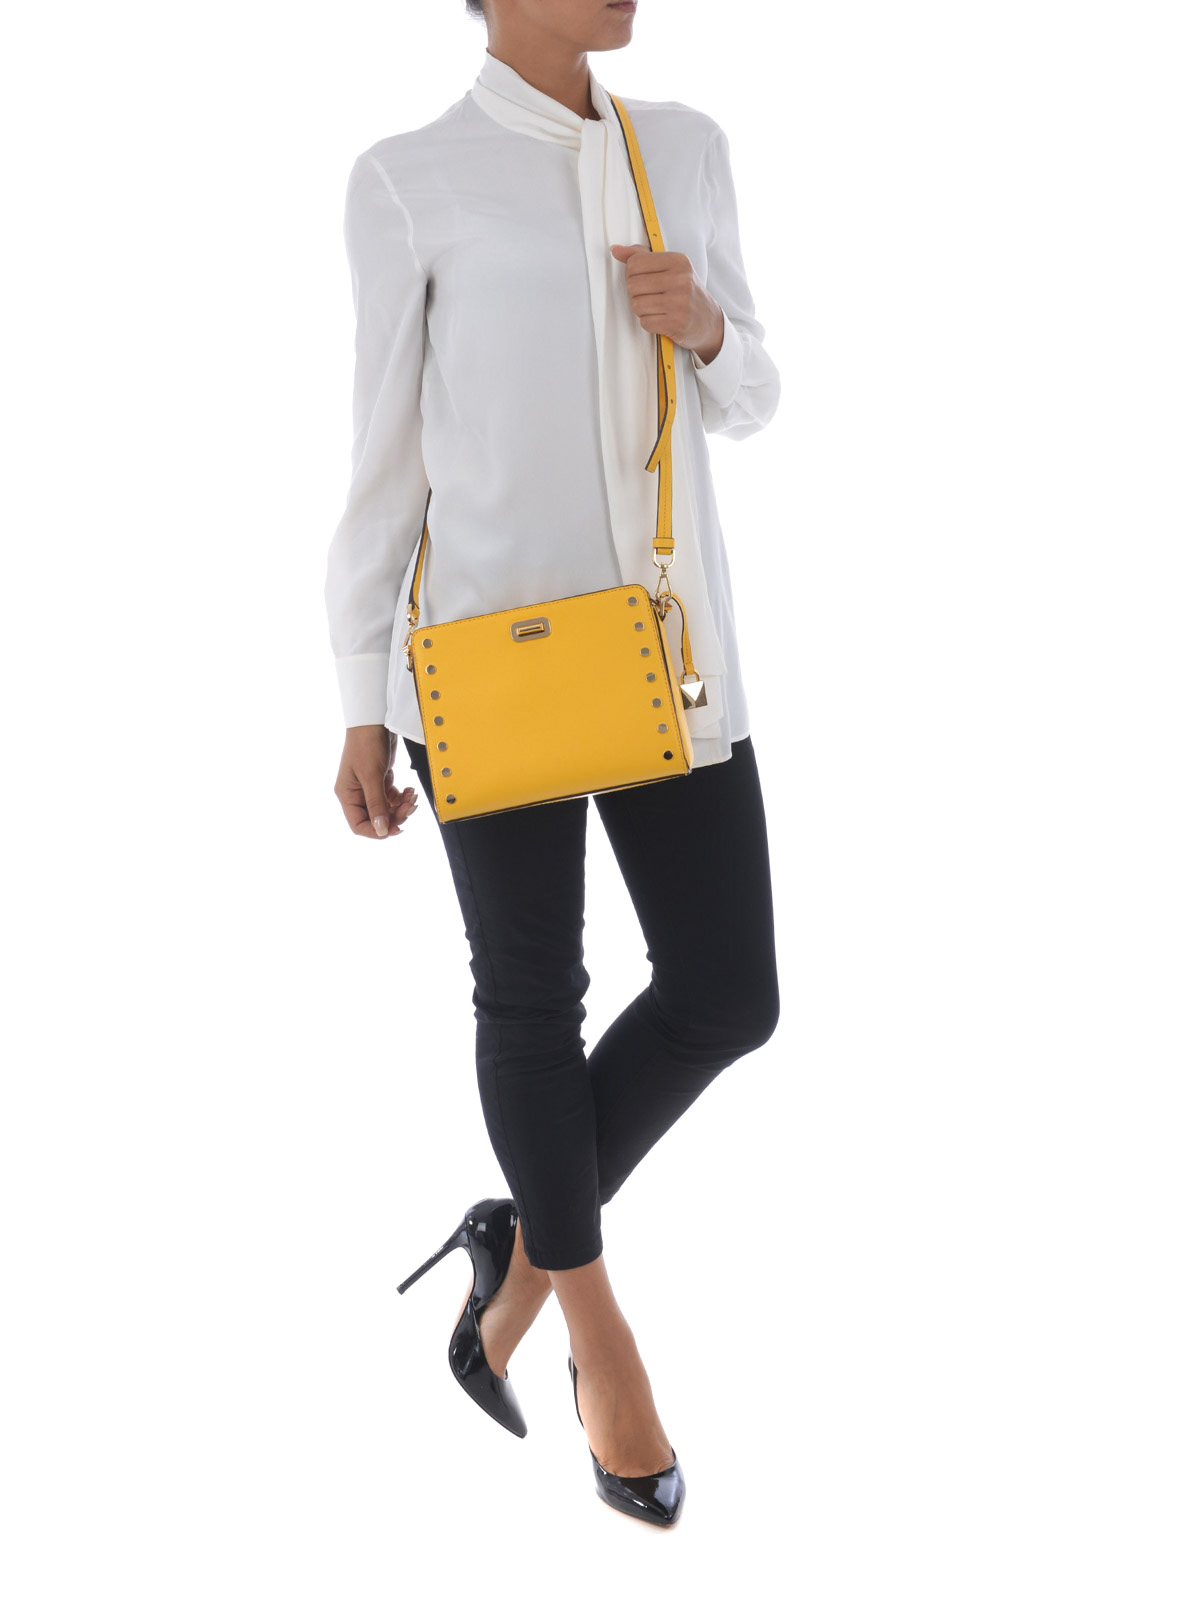 07c948e07e25 Michael Kors - Sylvie studded yellow messenger bag - cross body bags ...